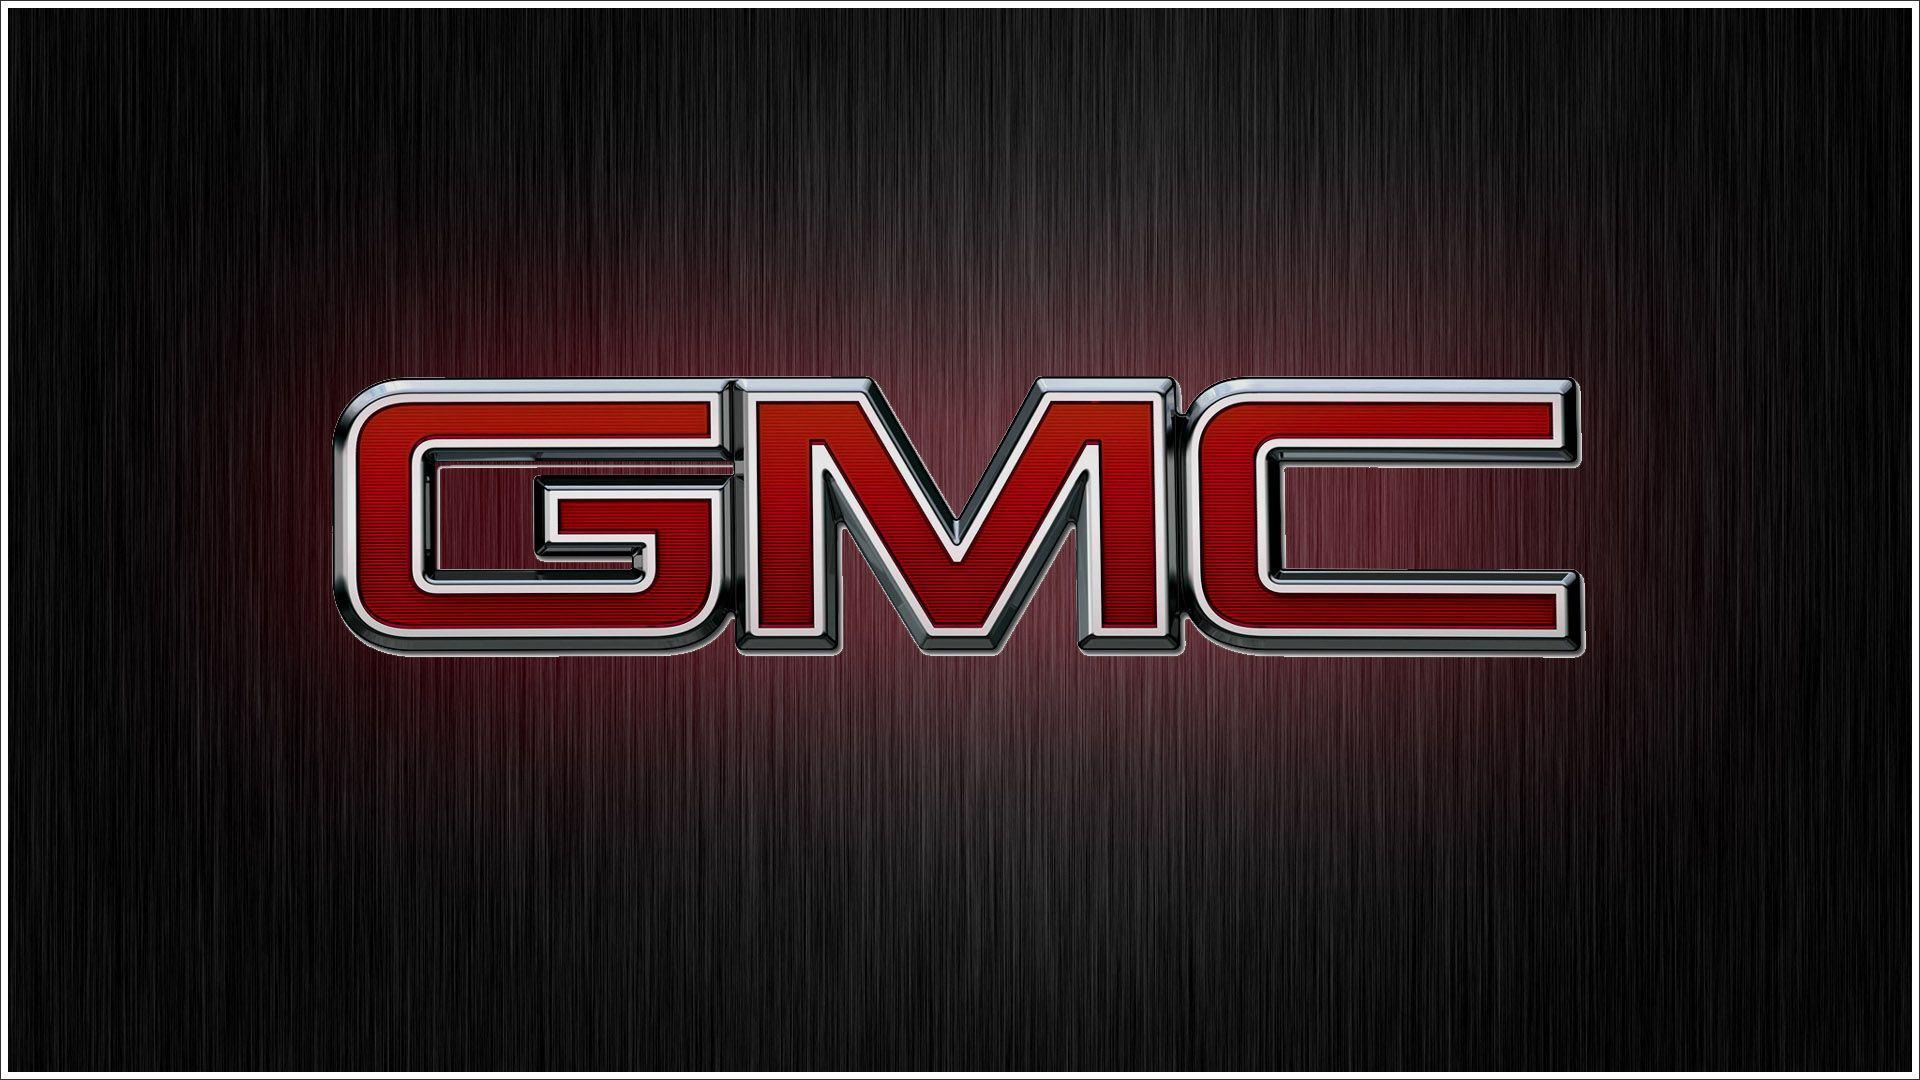 5 Gmc Logo Wallpapers On Wallpapersafari